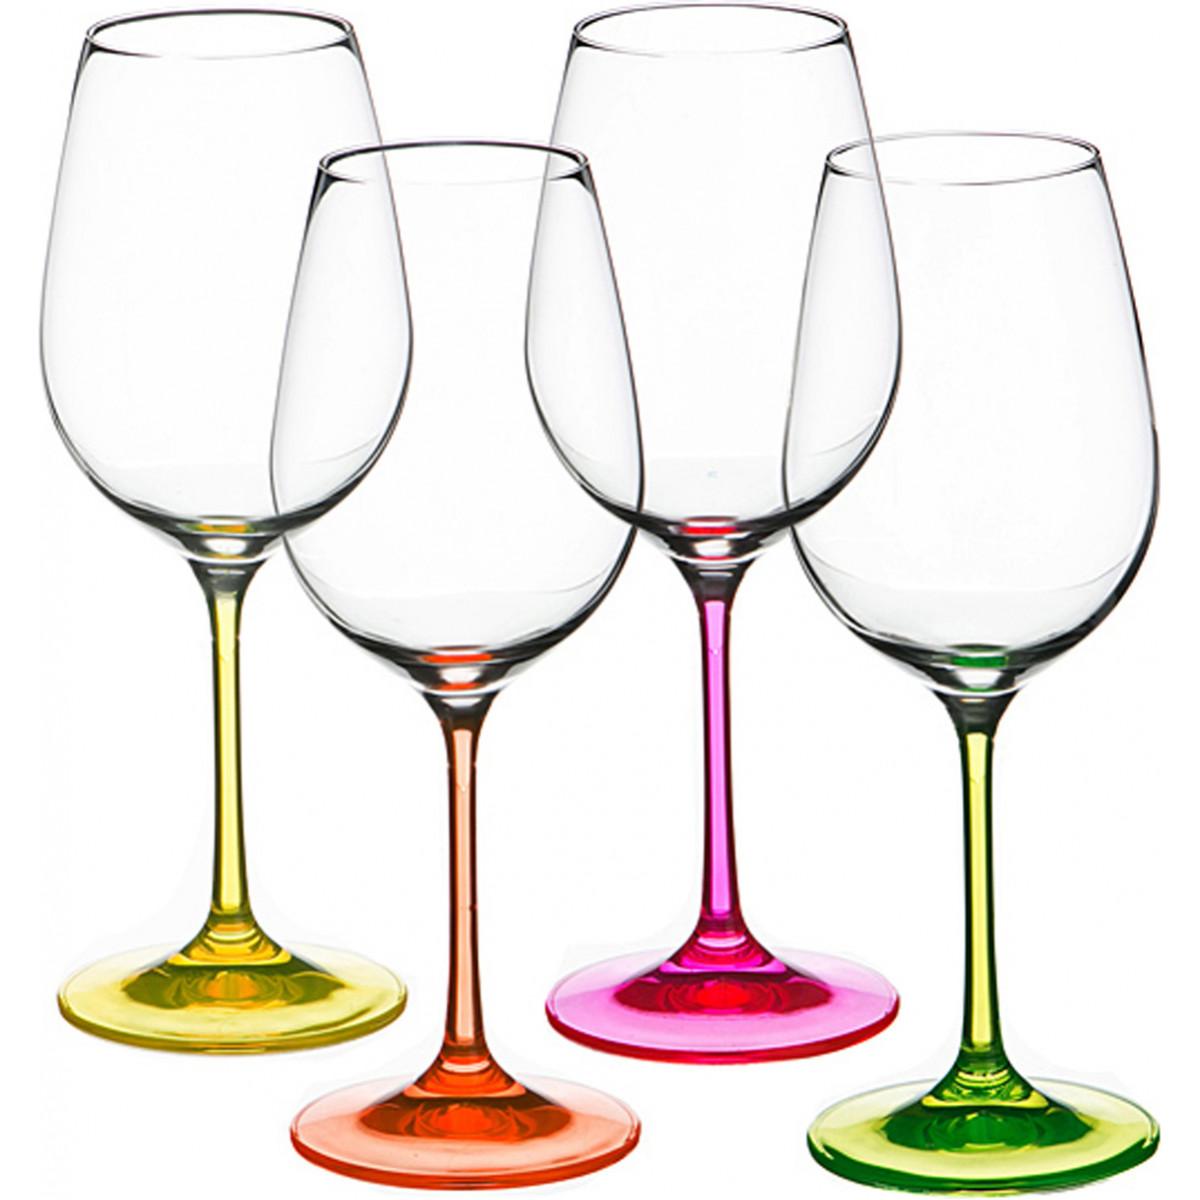 {} Bohemia Crystal Набор бокалов для вина Alma  (22 см - 4 шт) набор для кофе crystal bohemia mokko 4 предмета